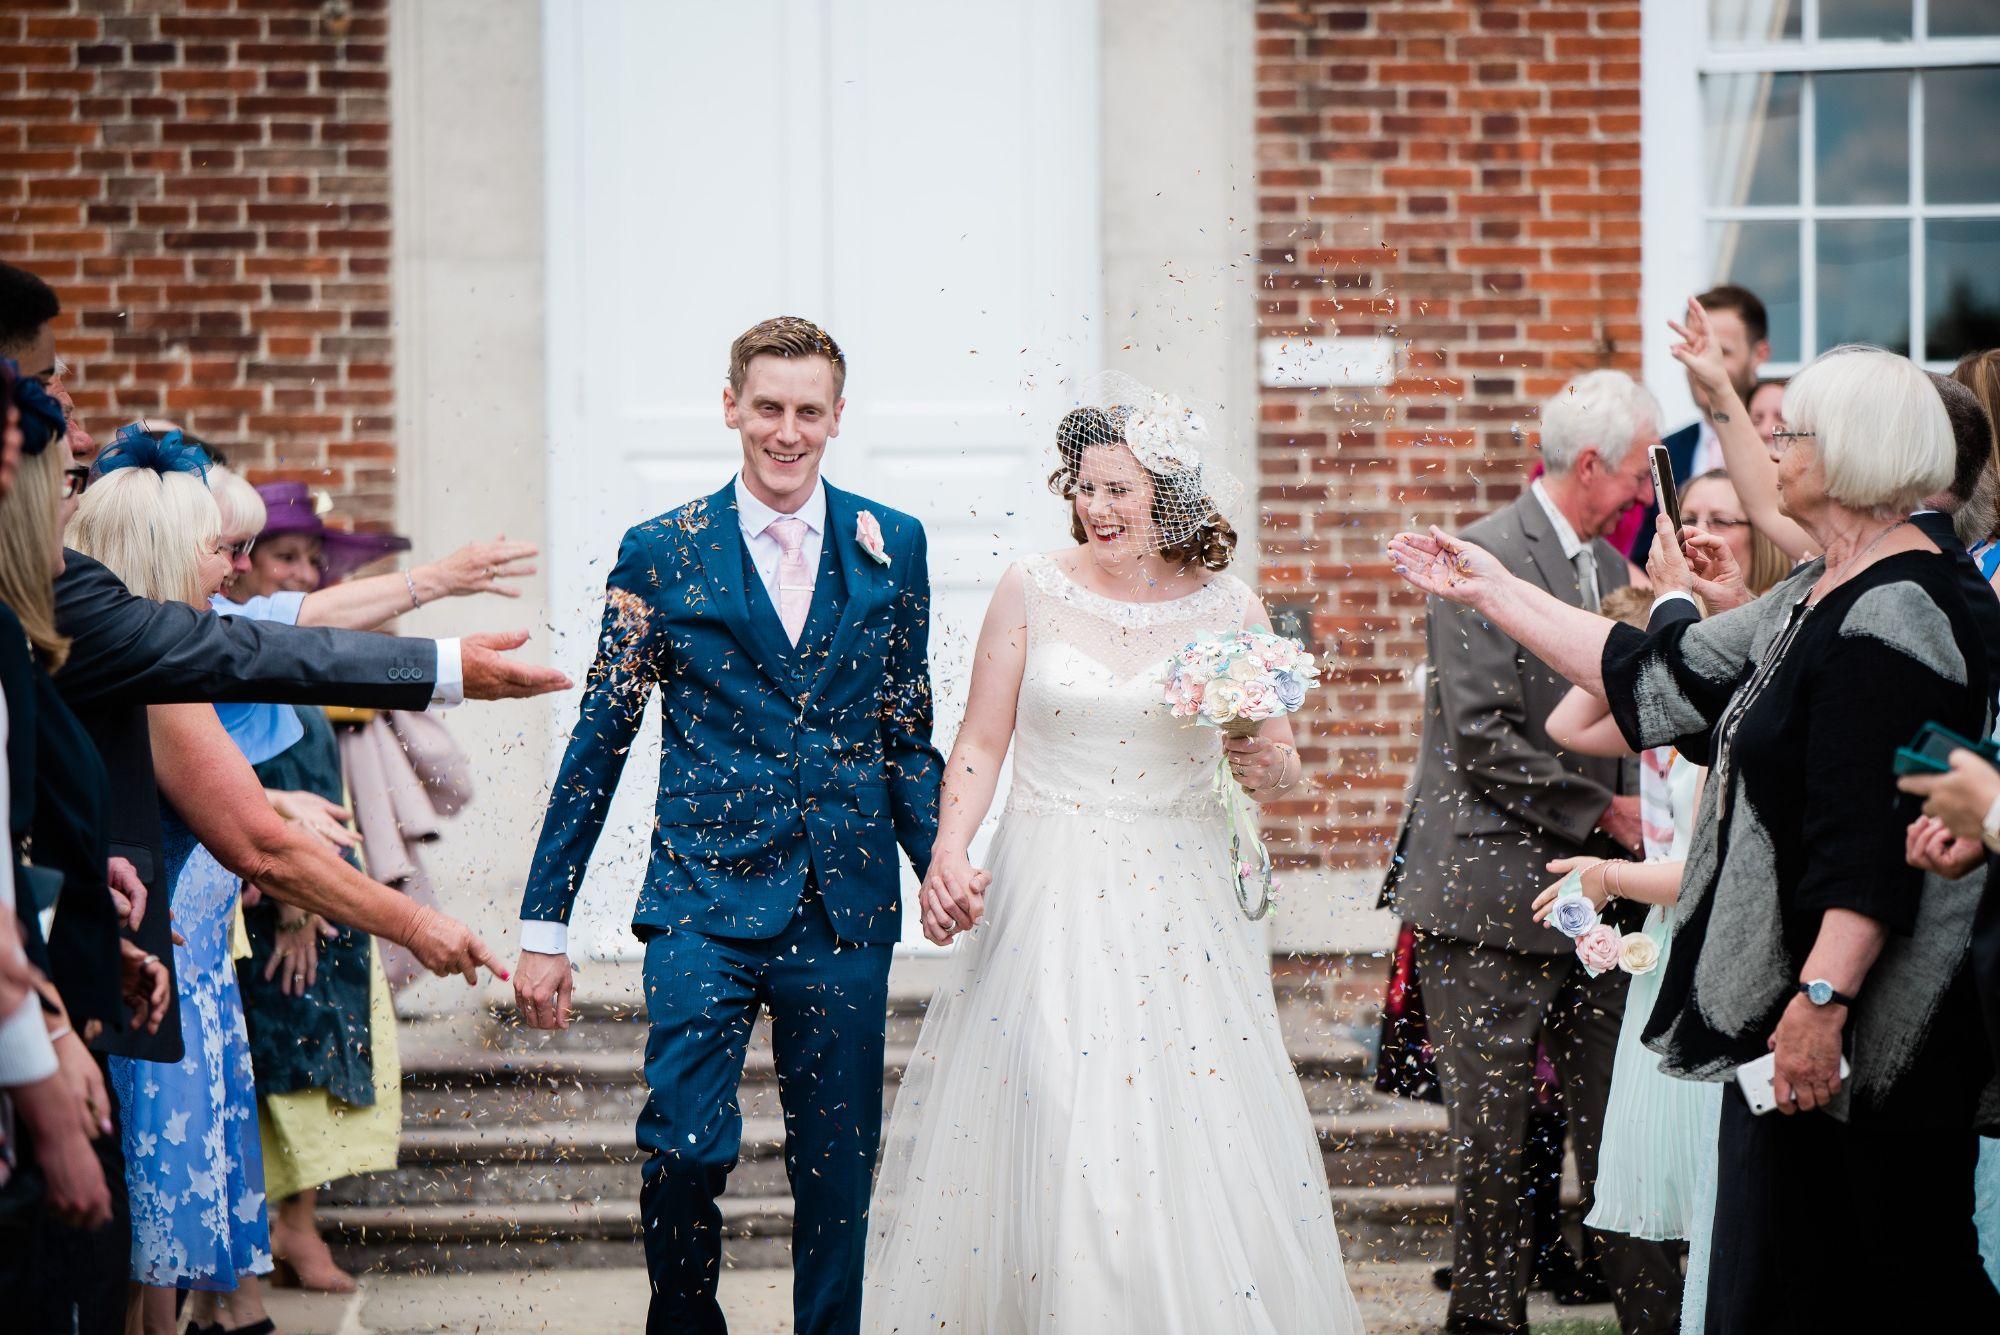 AH Wedding - Laura & Harry 37 (small)